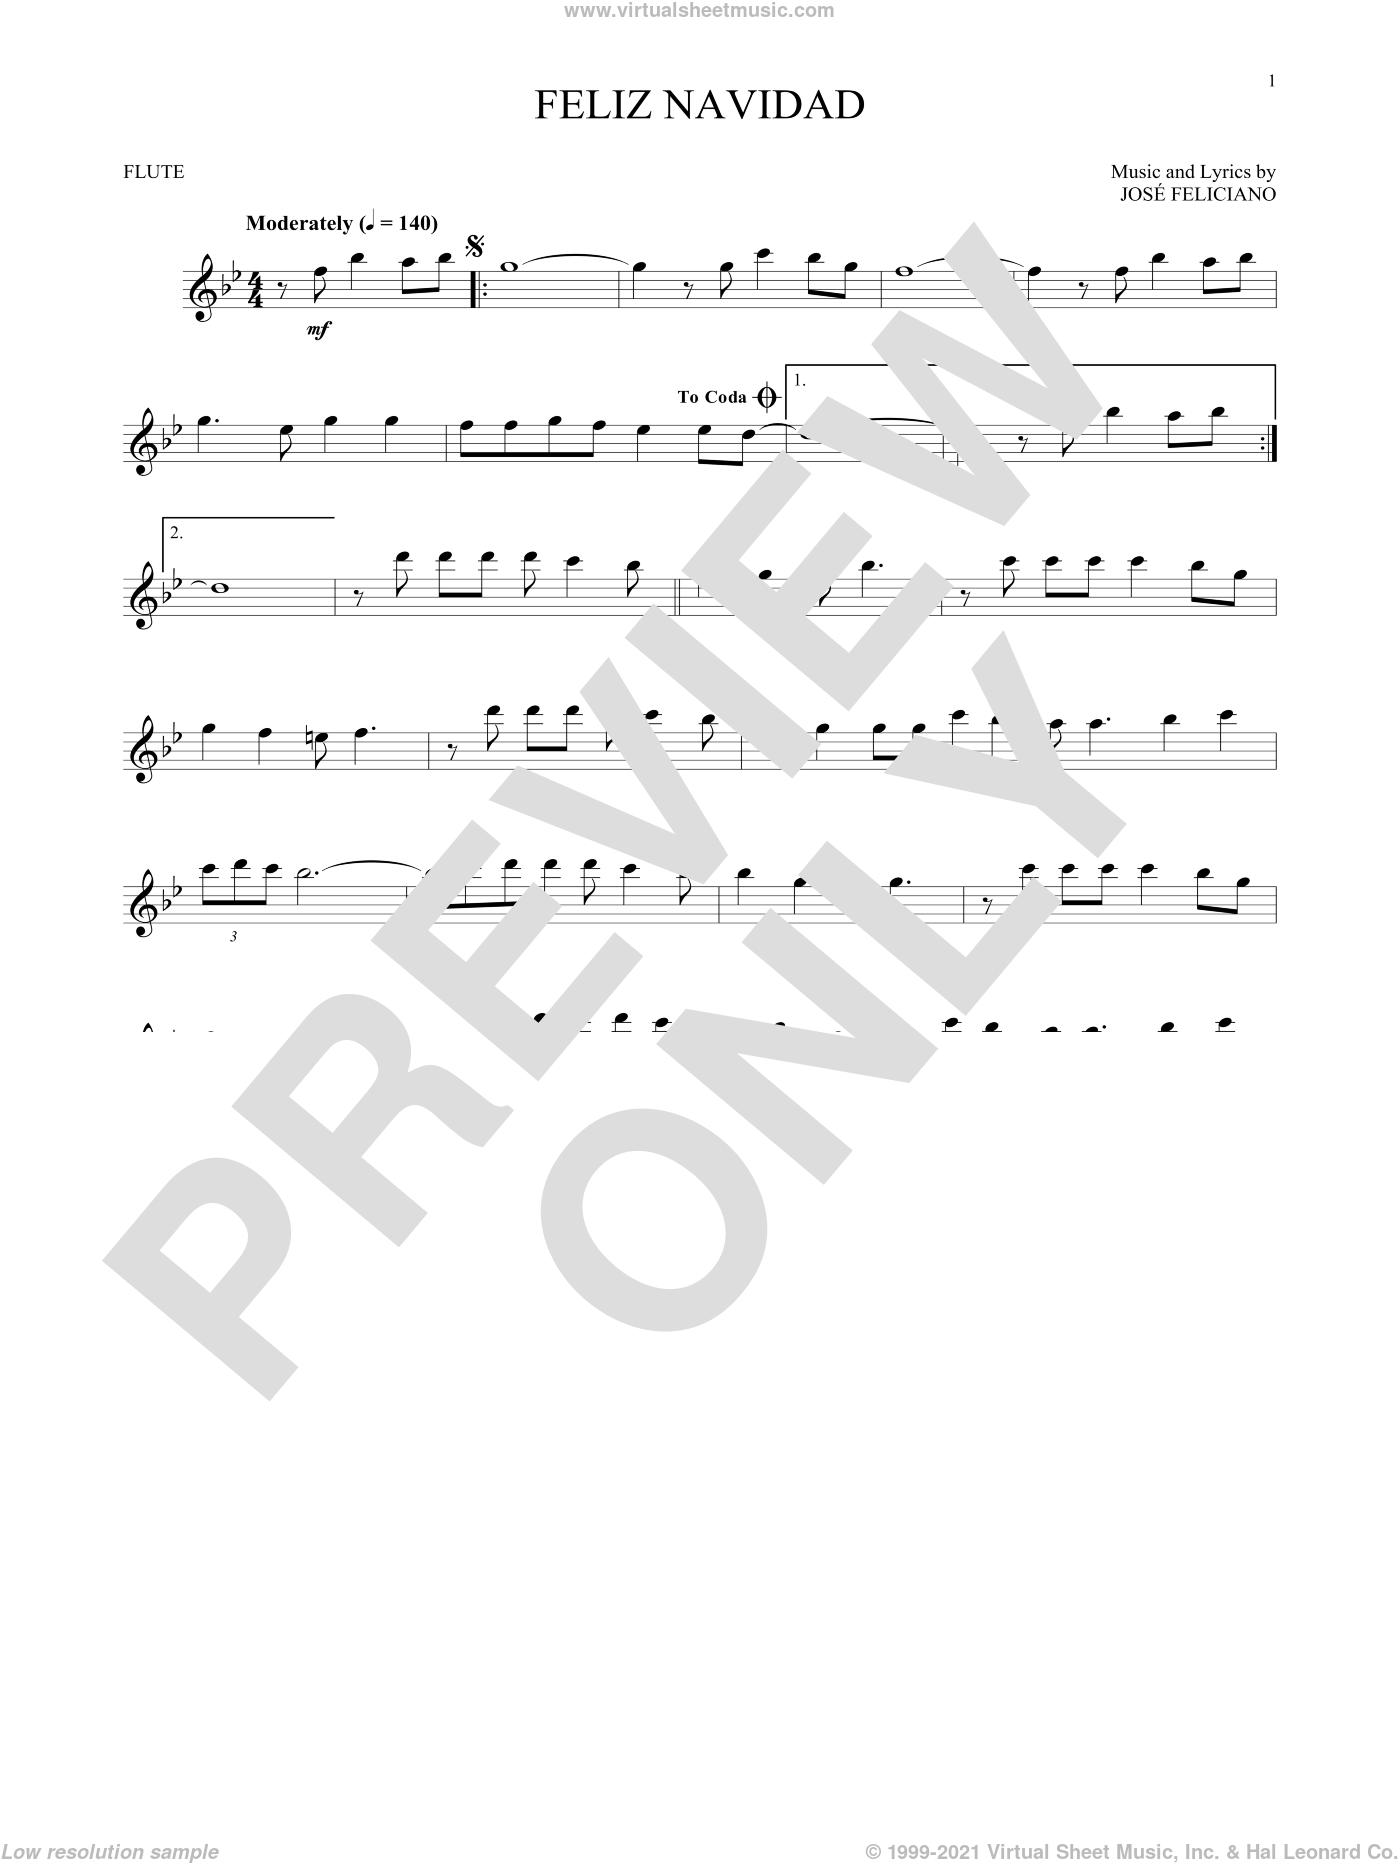 Feliz Navidad sheet music for flute solo by Jose Feliciano, intermediate skill level